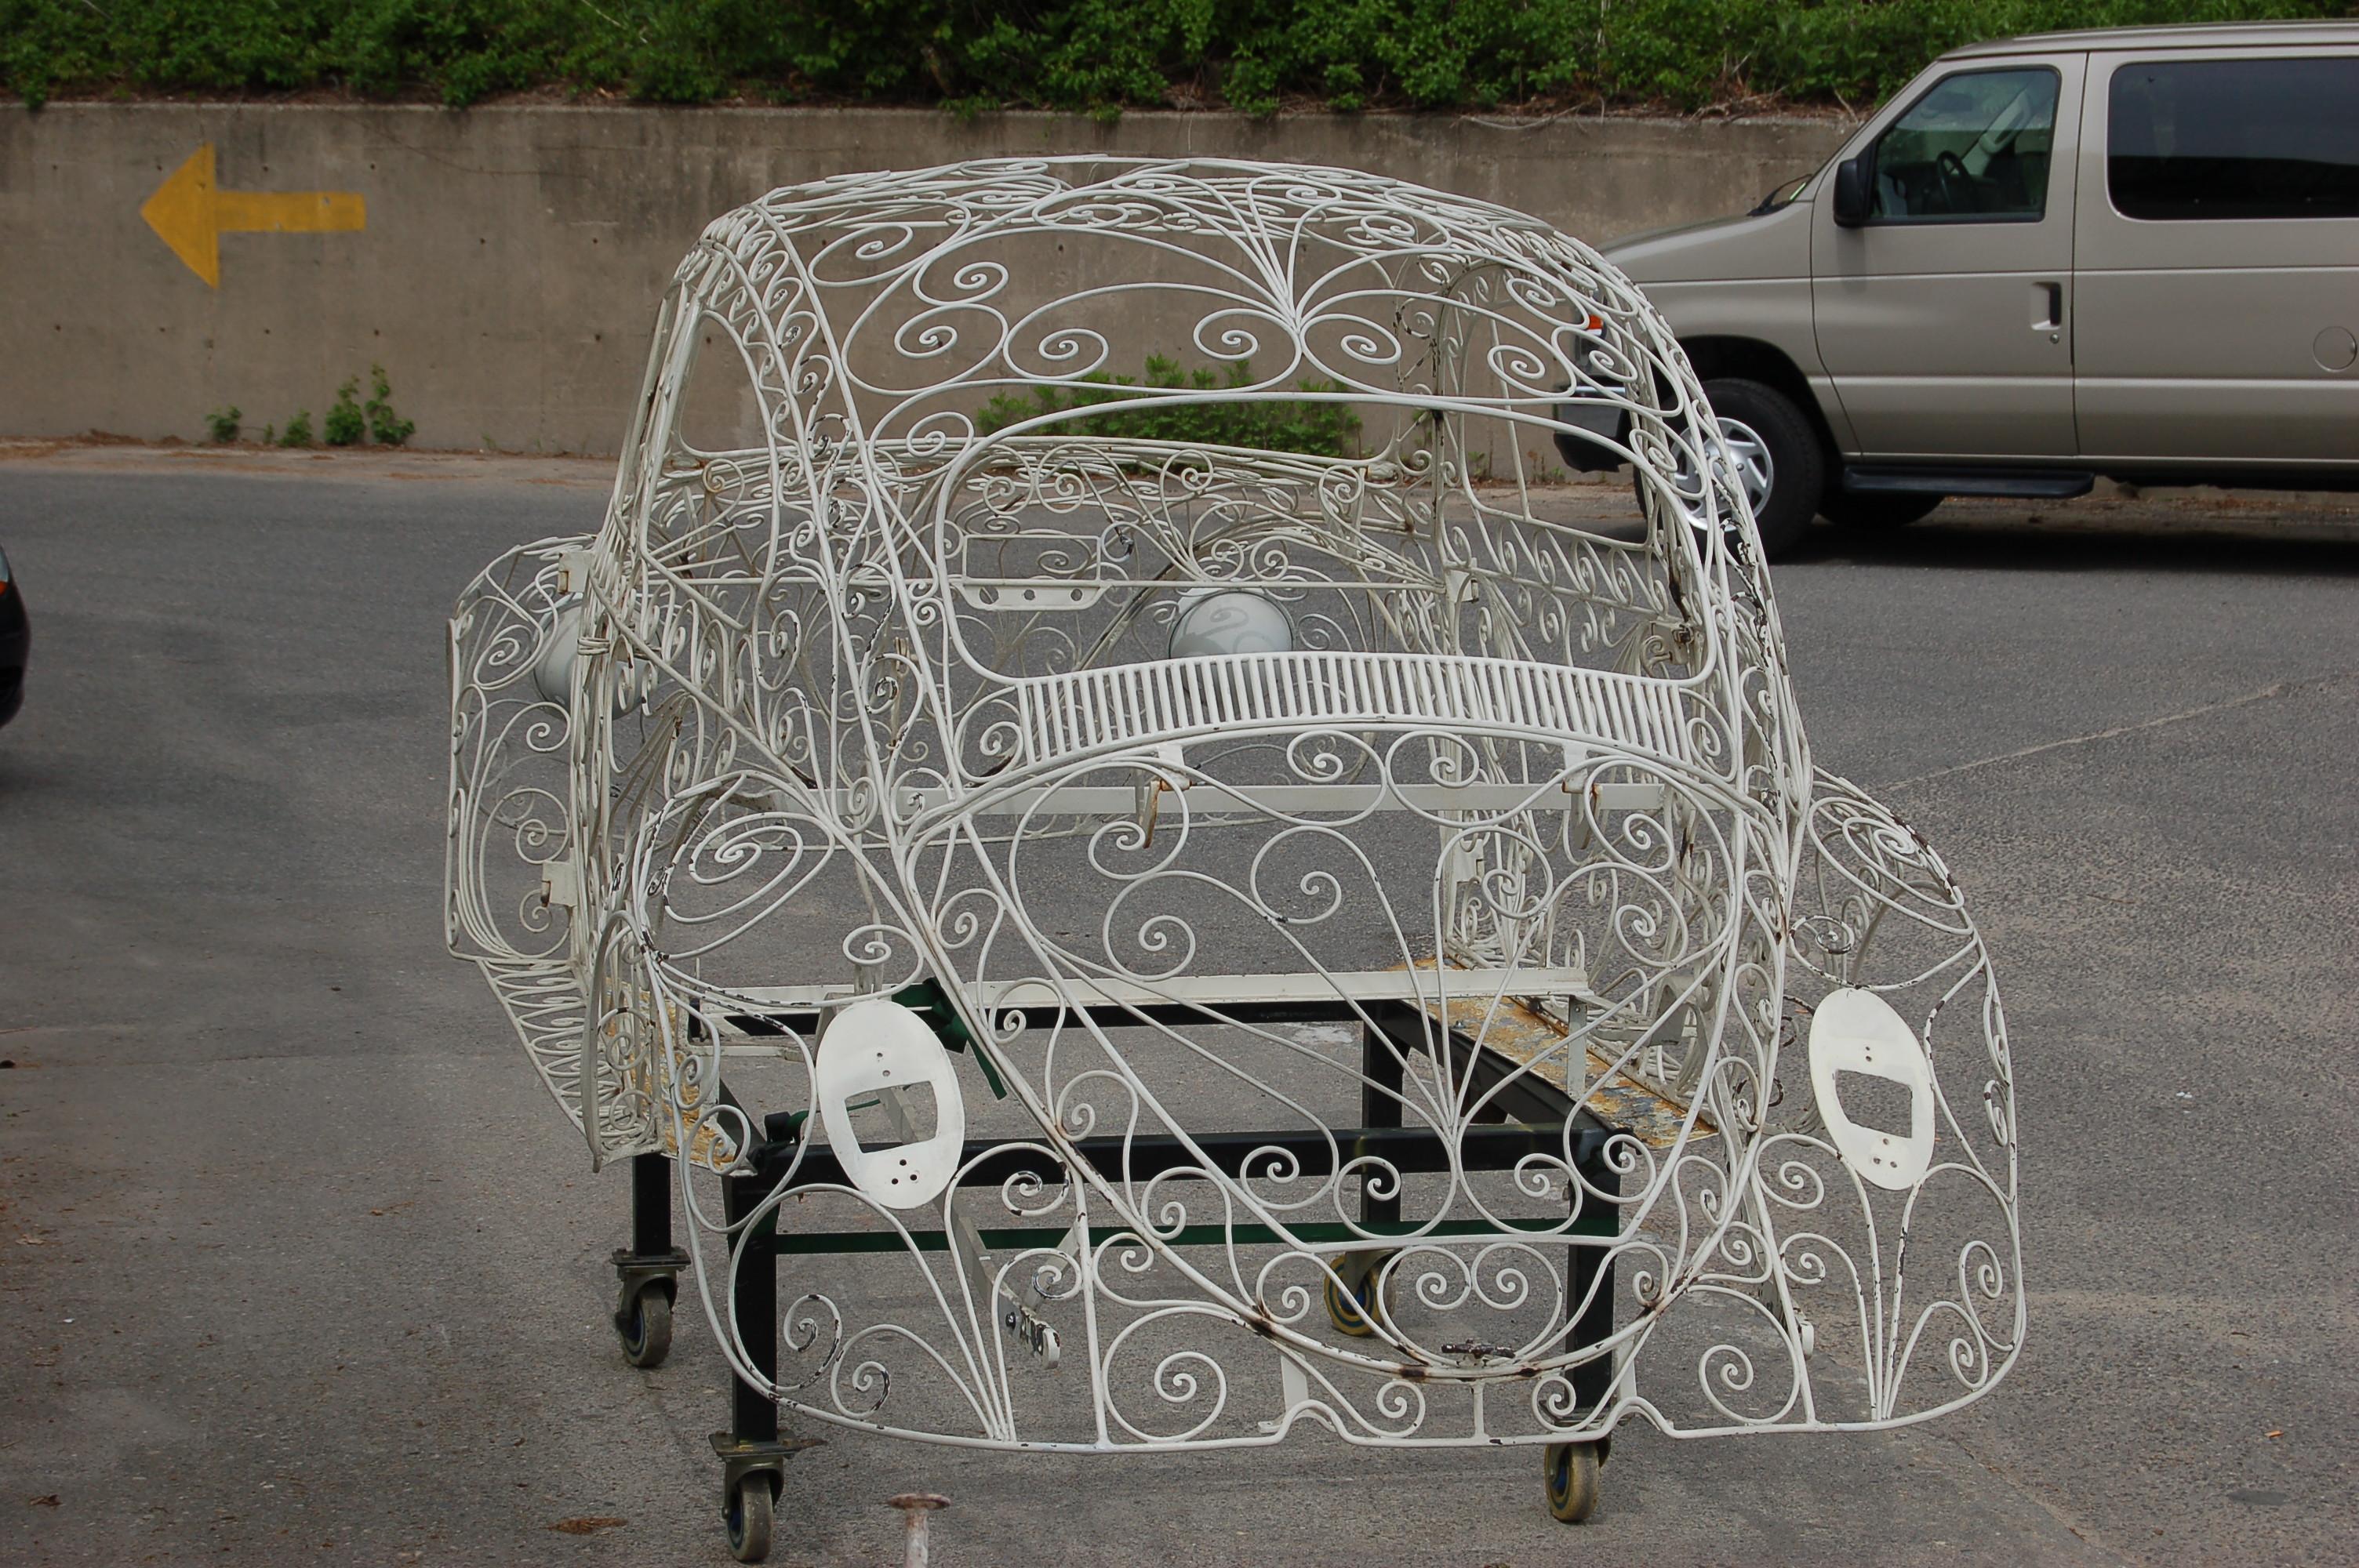 Wrought Iron VW Beetle Rear_American Dry Stripping Wedding Car